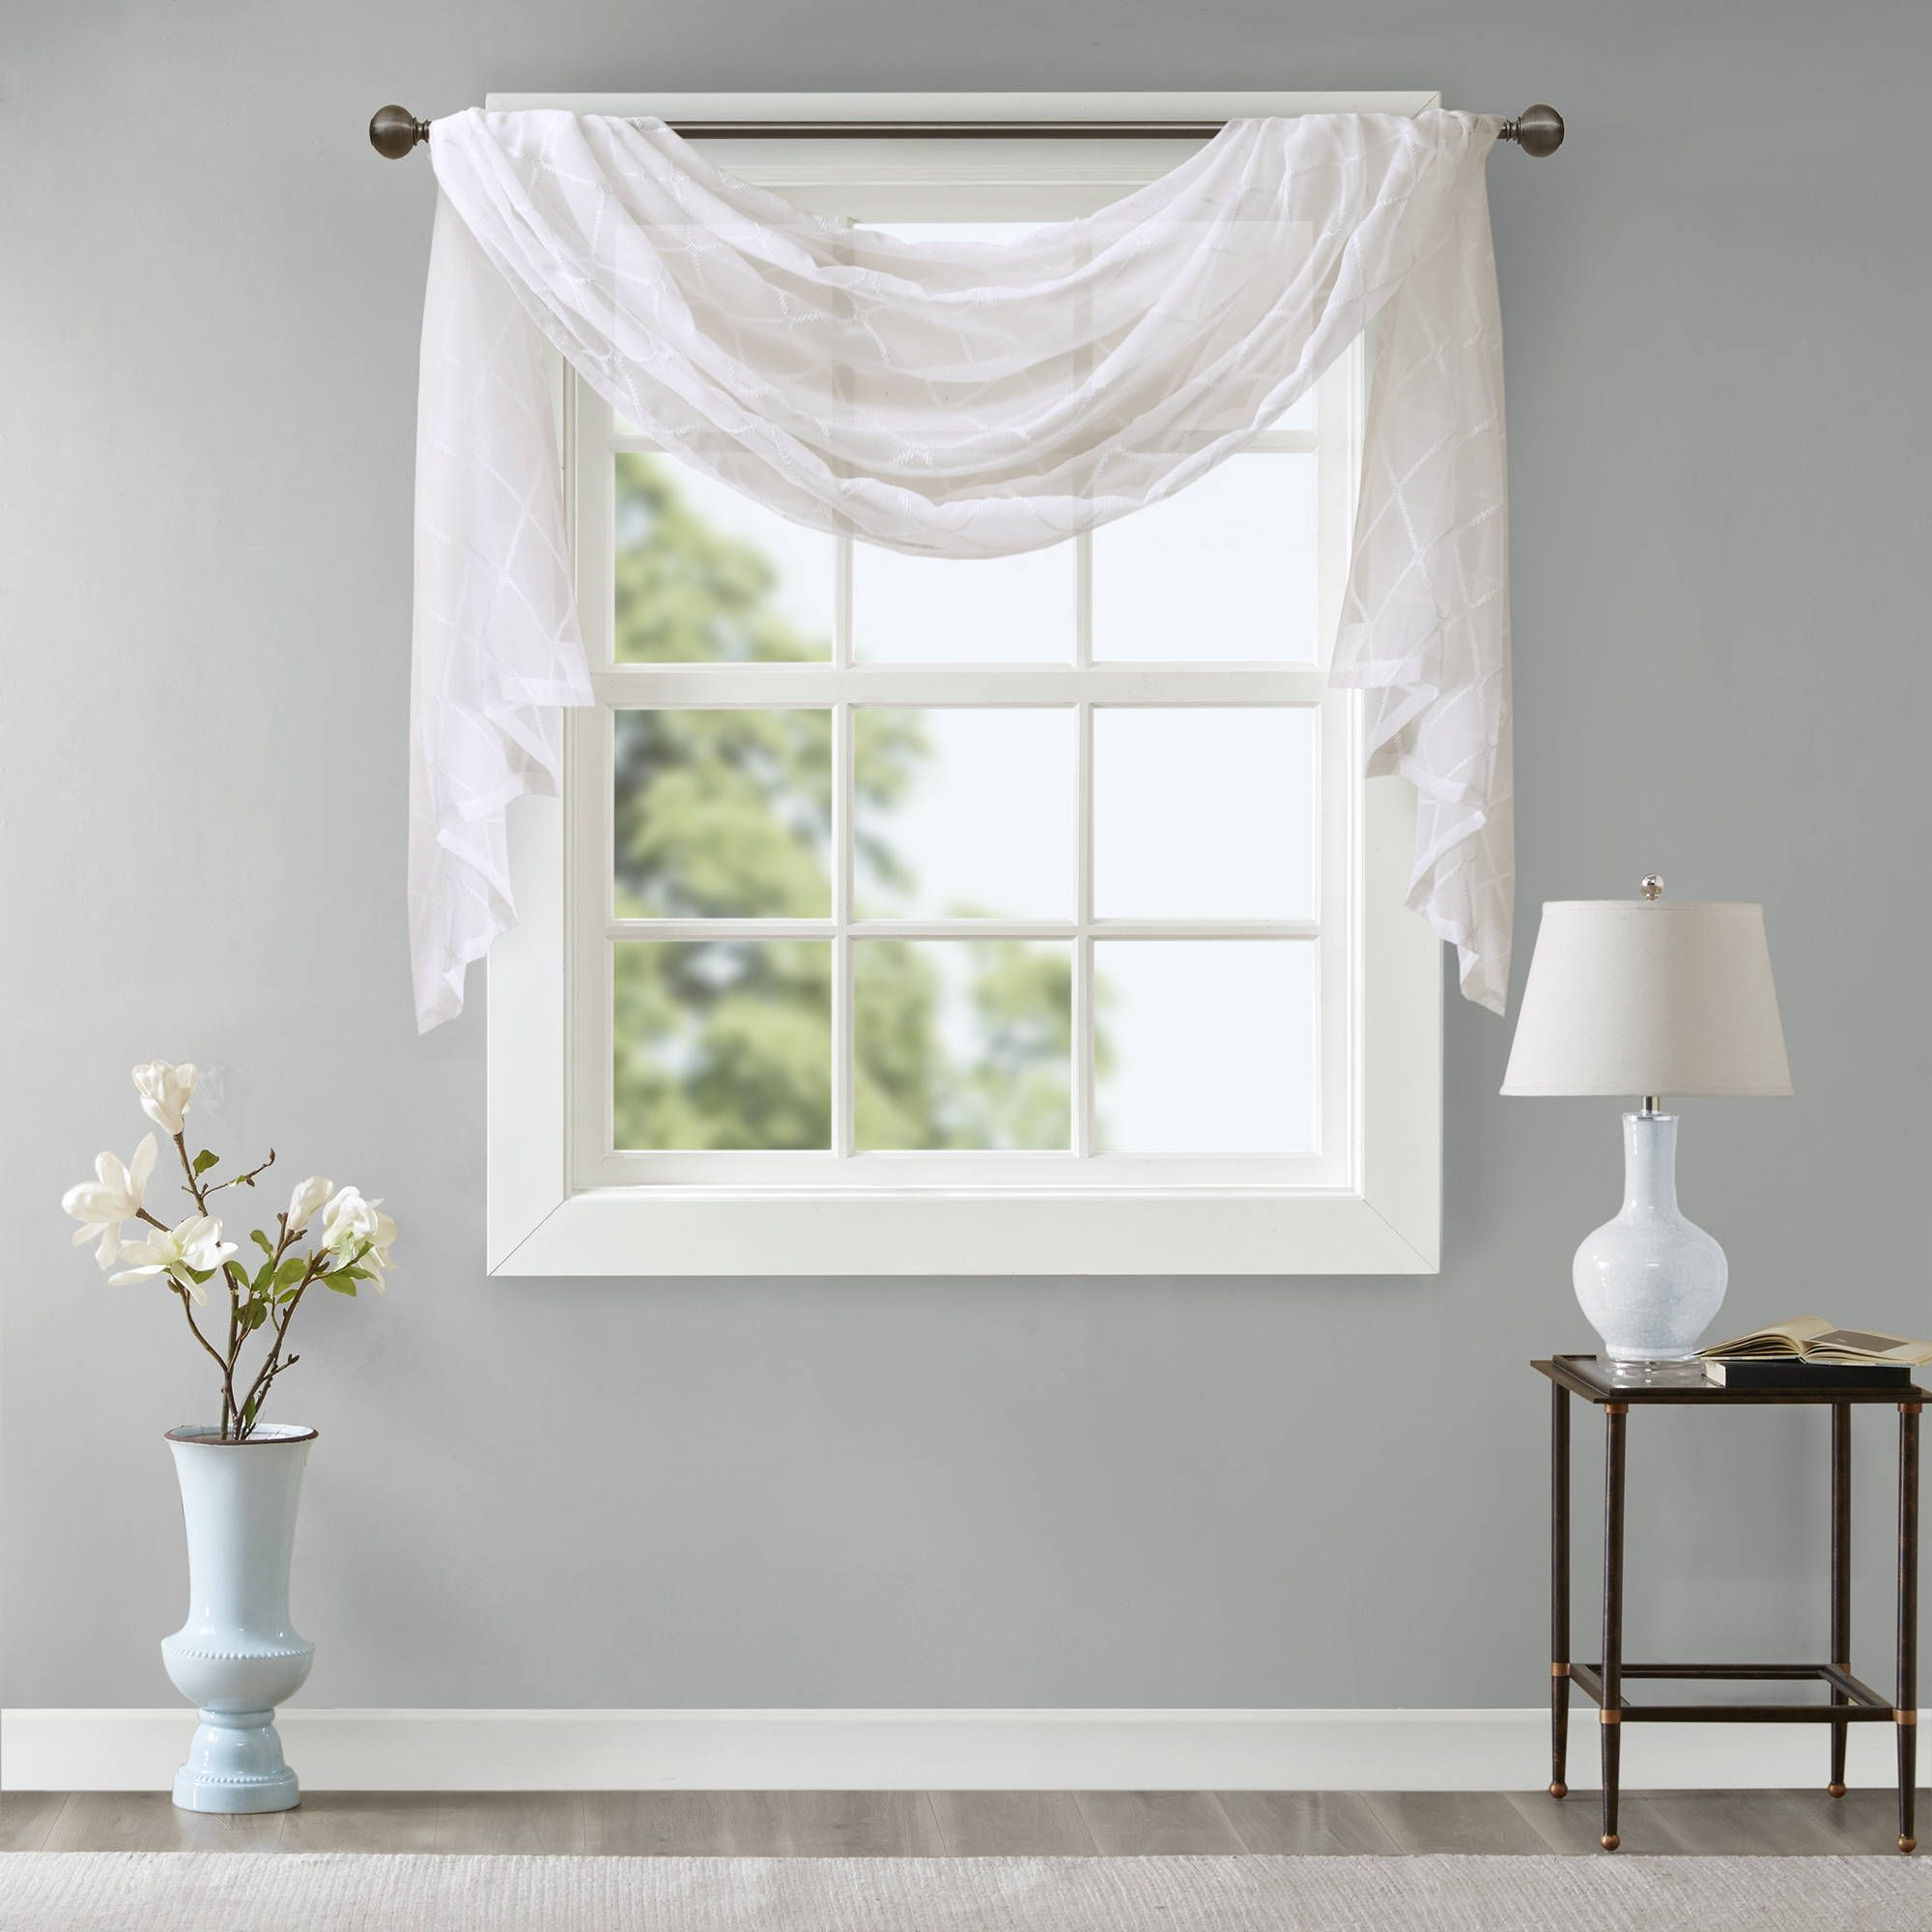 Madison park iris diamond sheer embroidered window curtain scarf